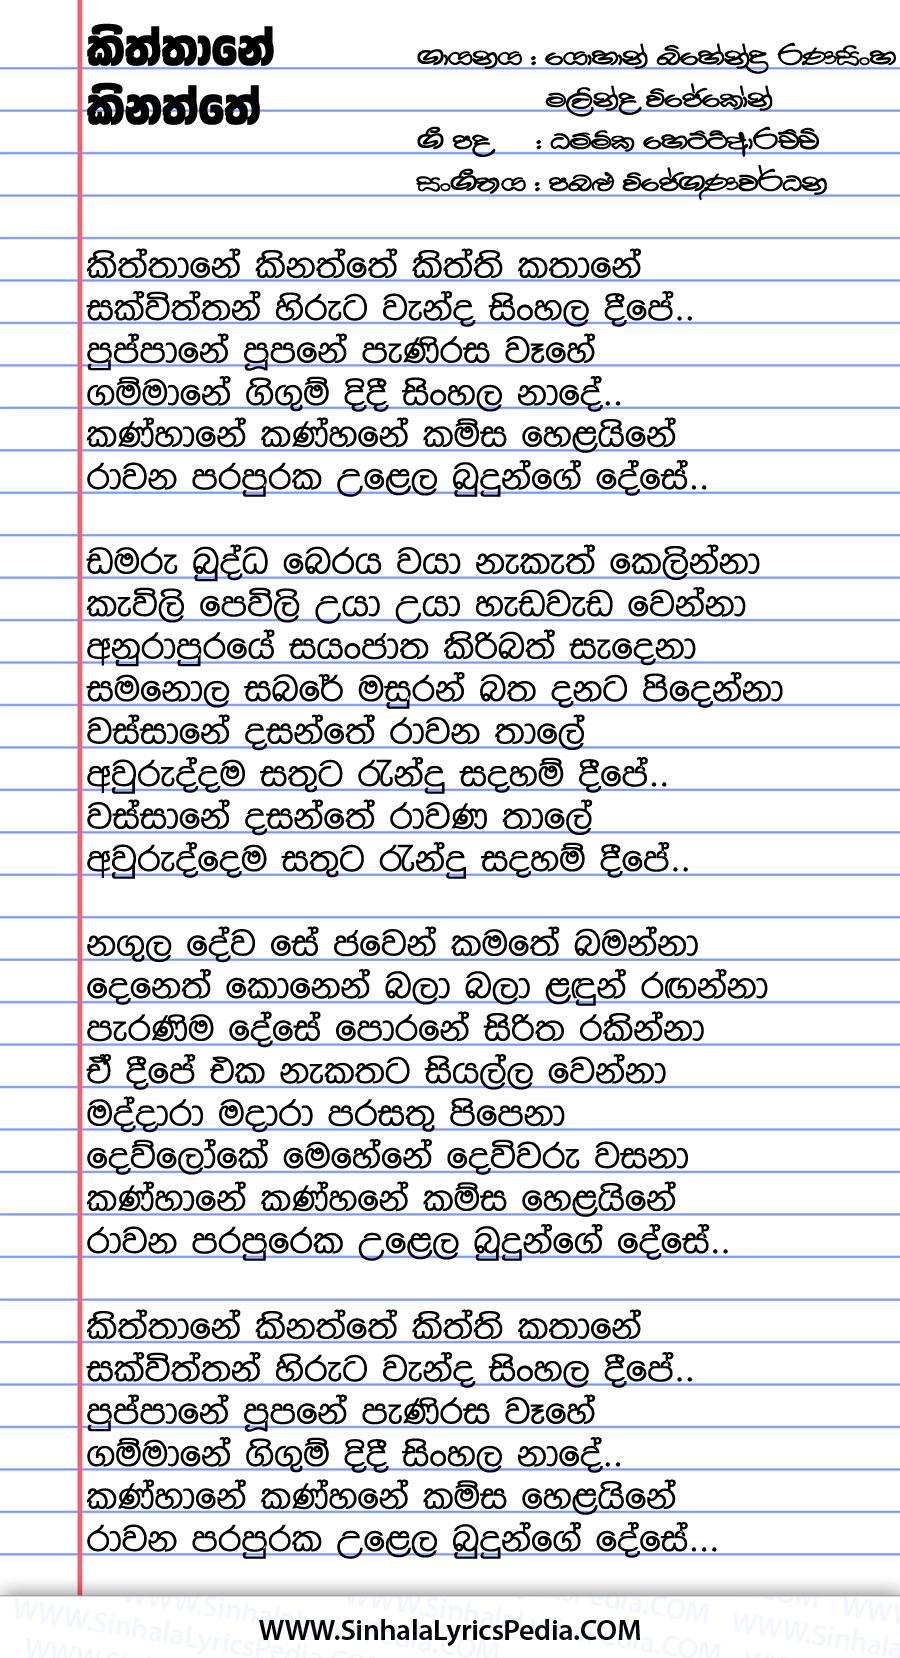 Kiththane Kinaththe (Original) Song Lyrics